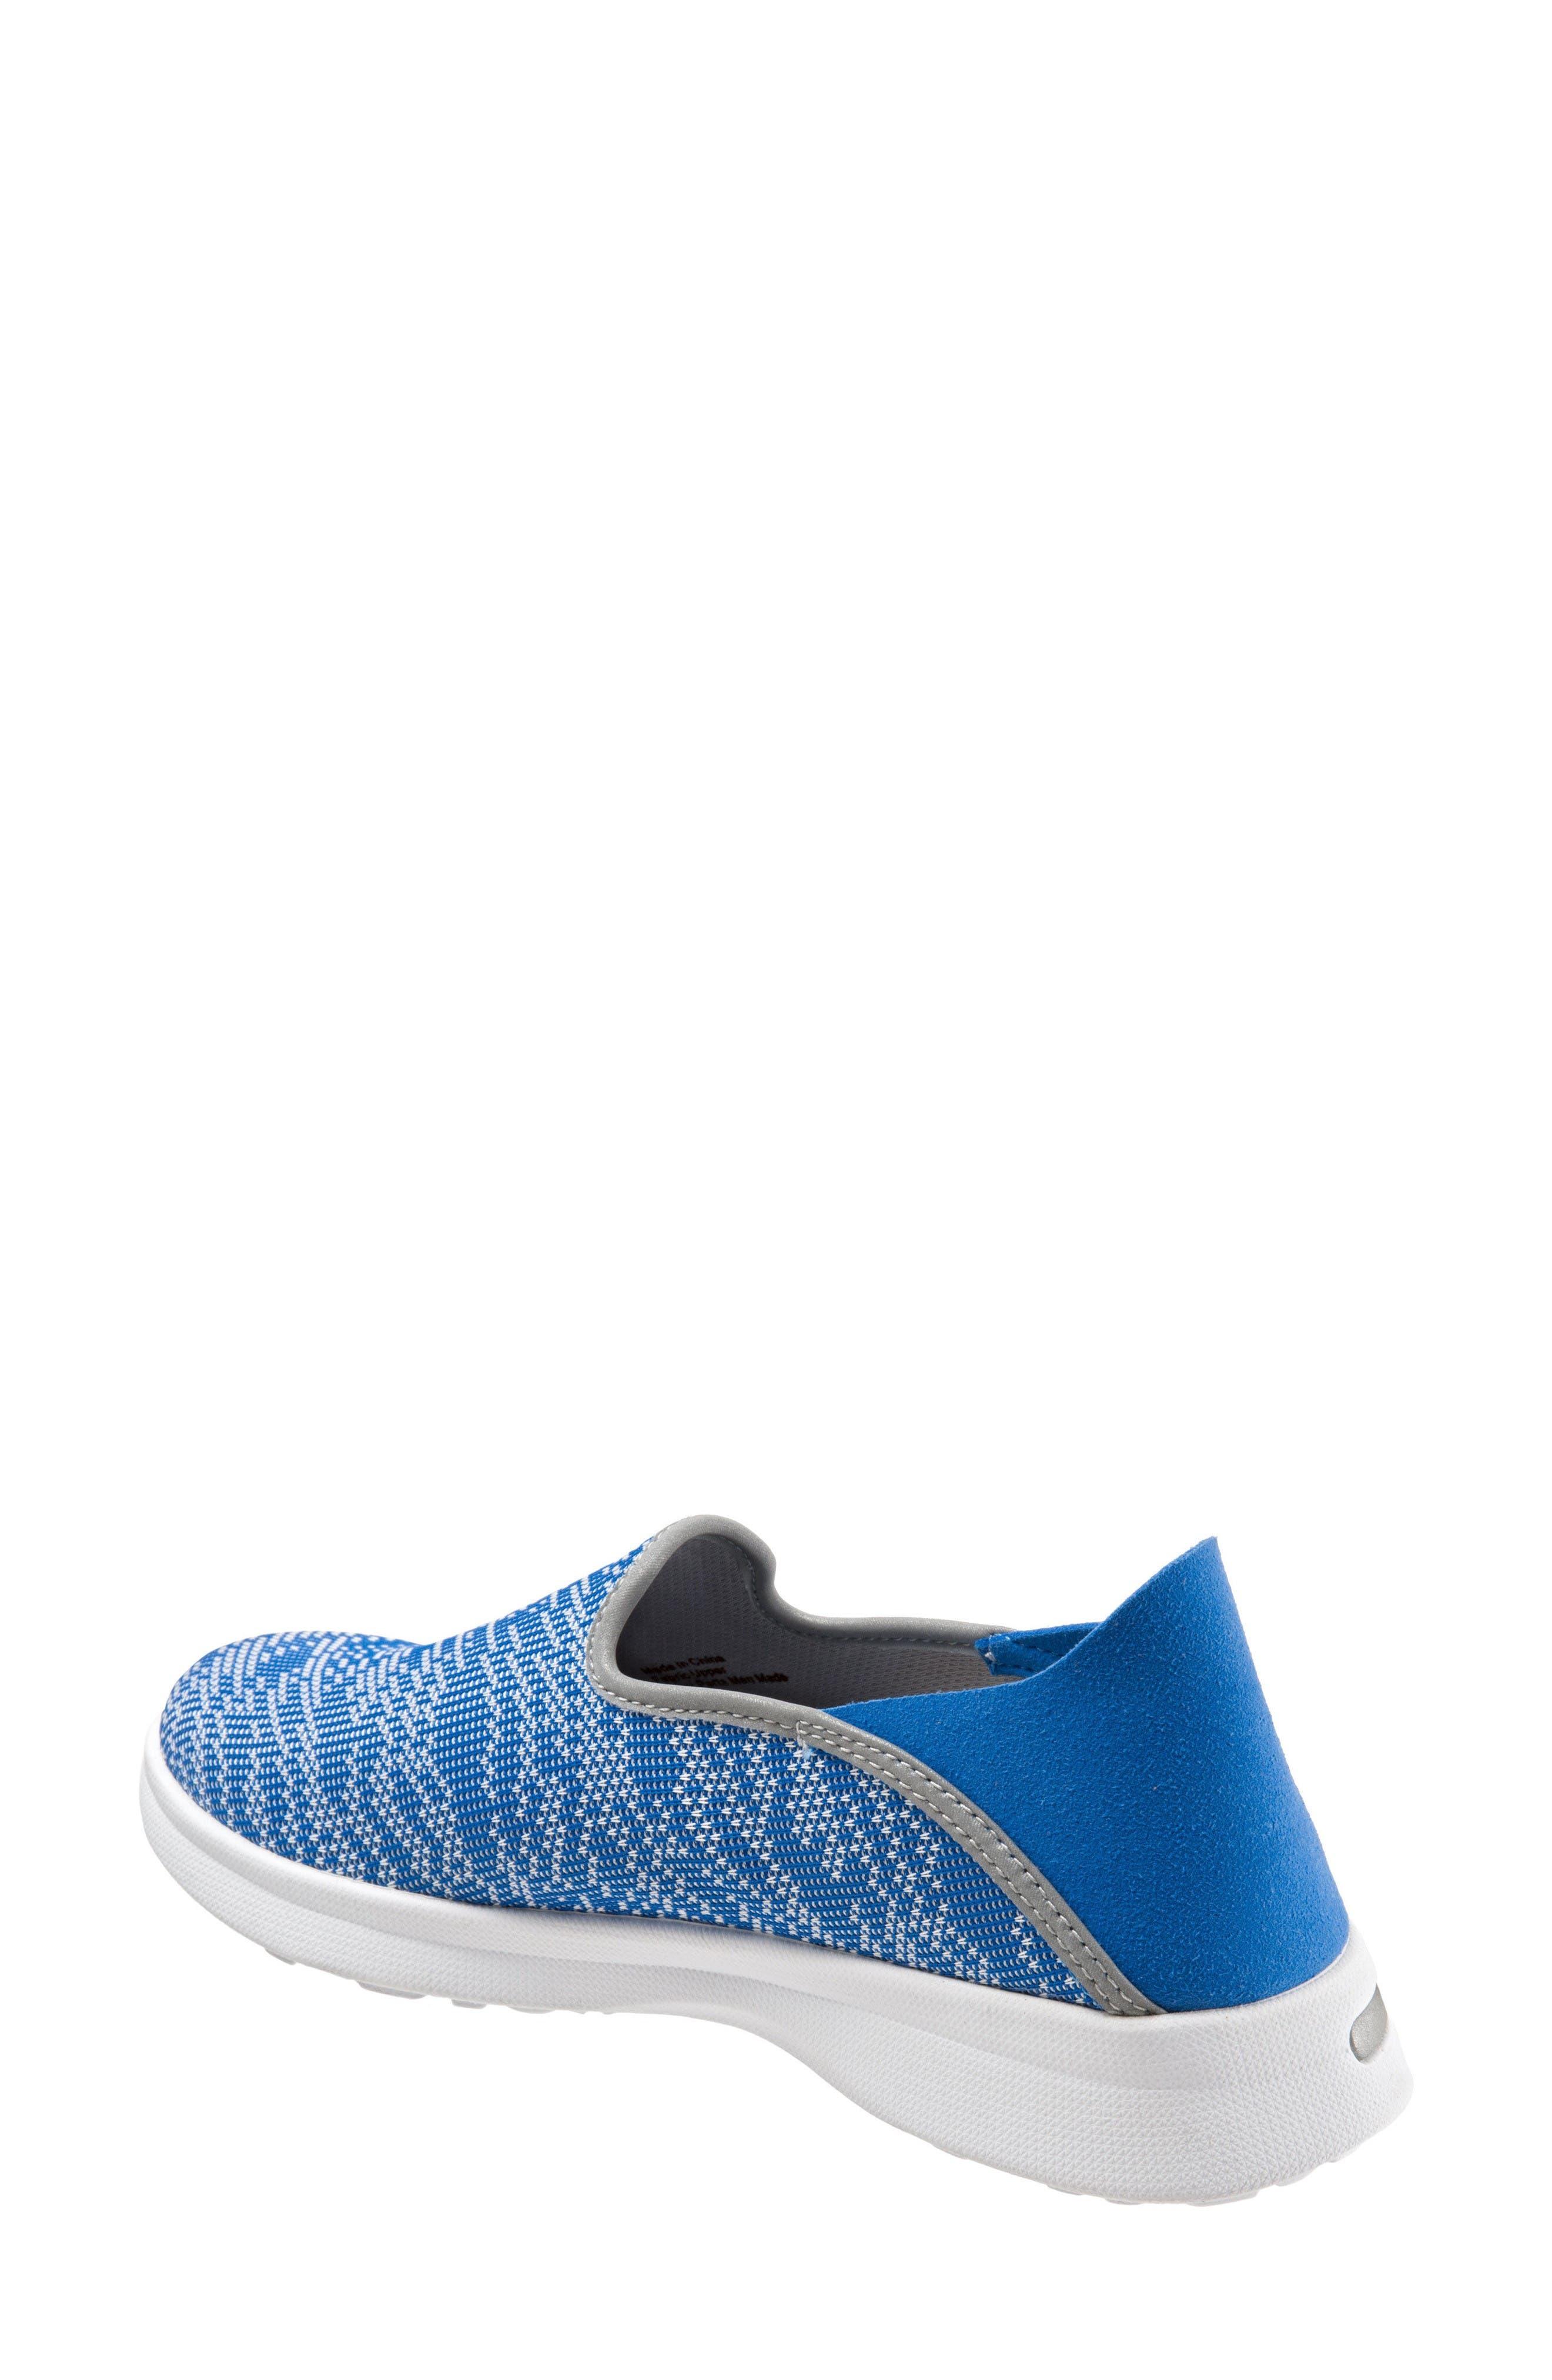 SOFTWALK Women's Softwalk Convertible Slip-On Sneaker lEHO0GA